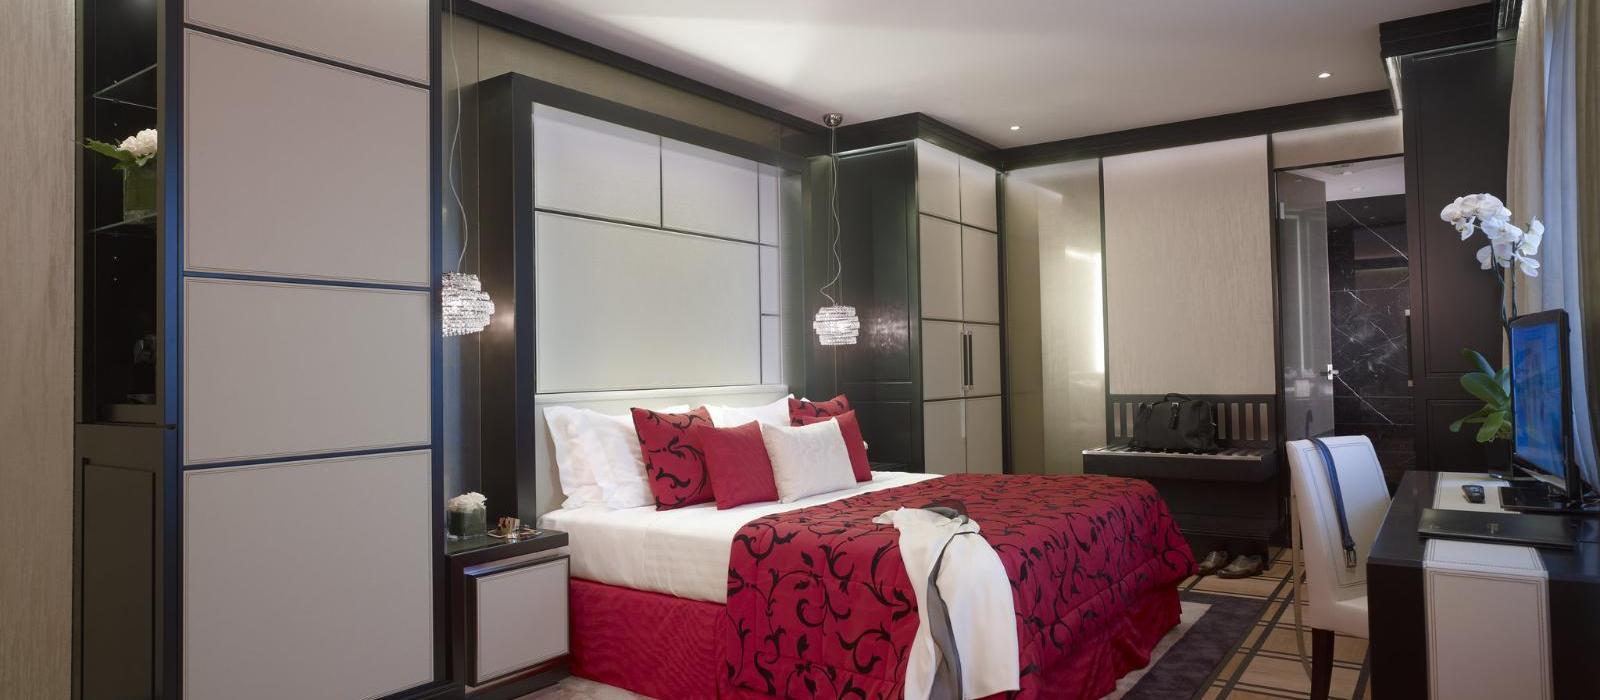 卡尔顿巴廖尼酒店(Baglioni Hotel Carlton) 图片  www.lhw.cn